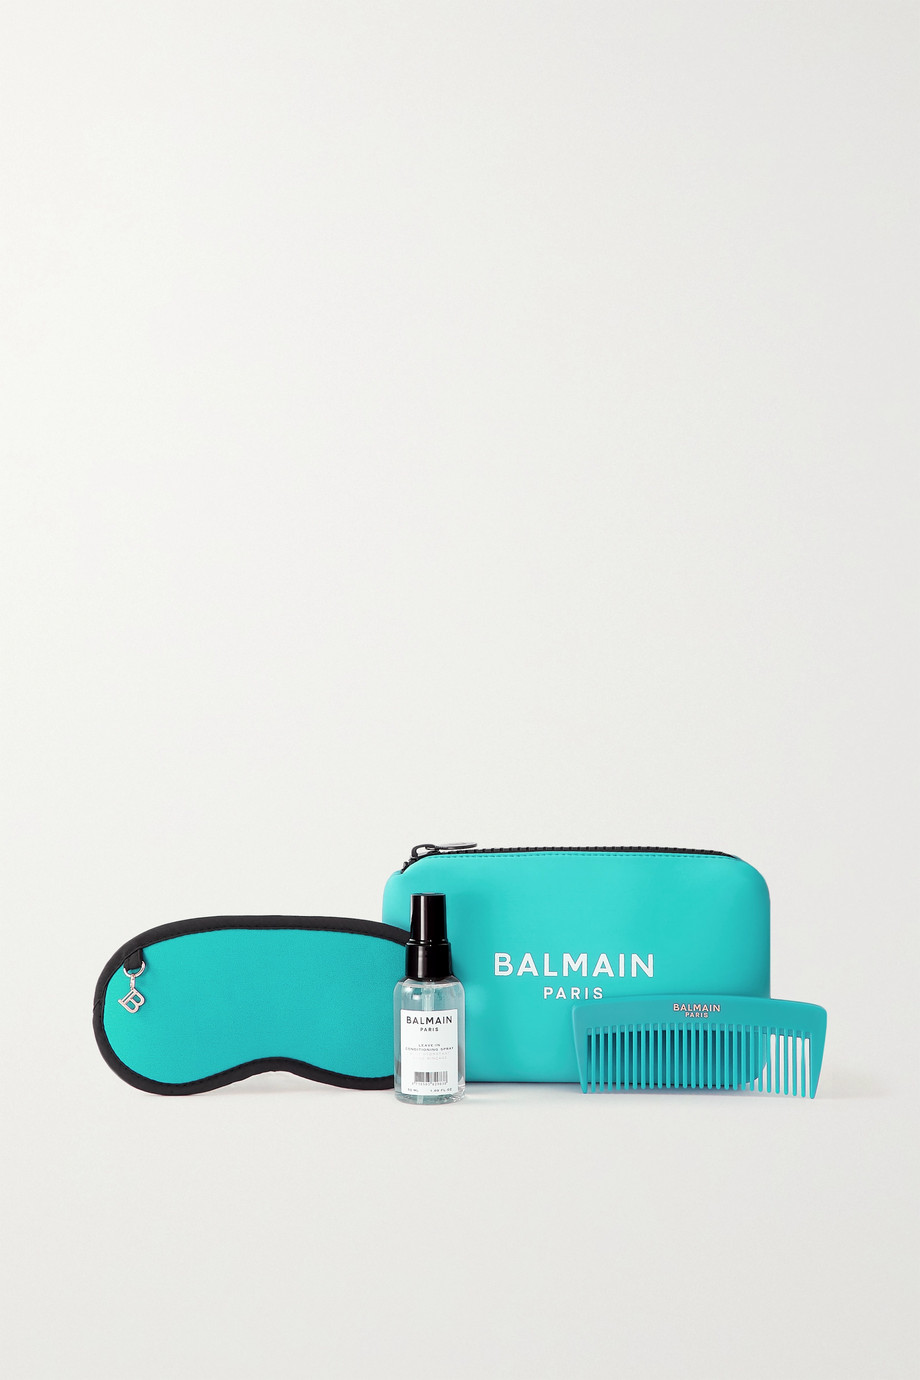 Balmain Paris Hair Couture Cosmetic Bag Set - Turquoise